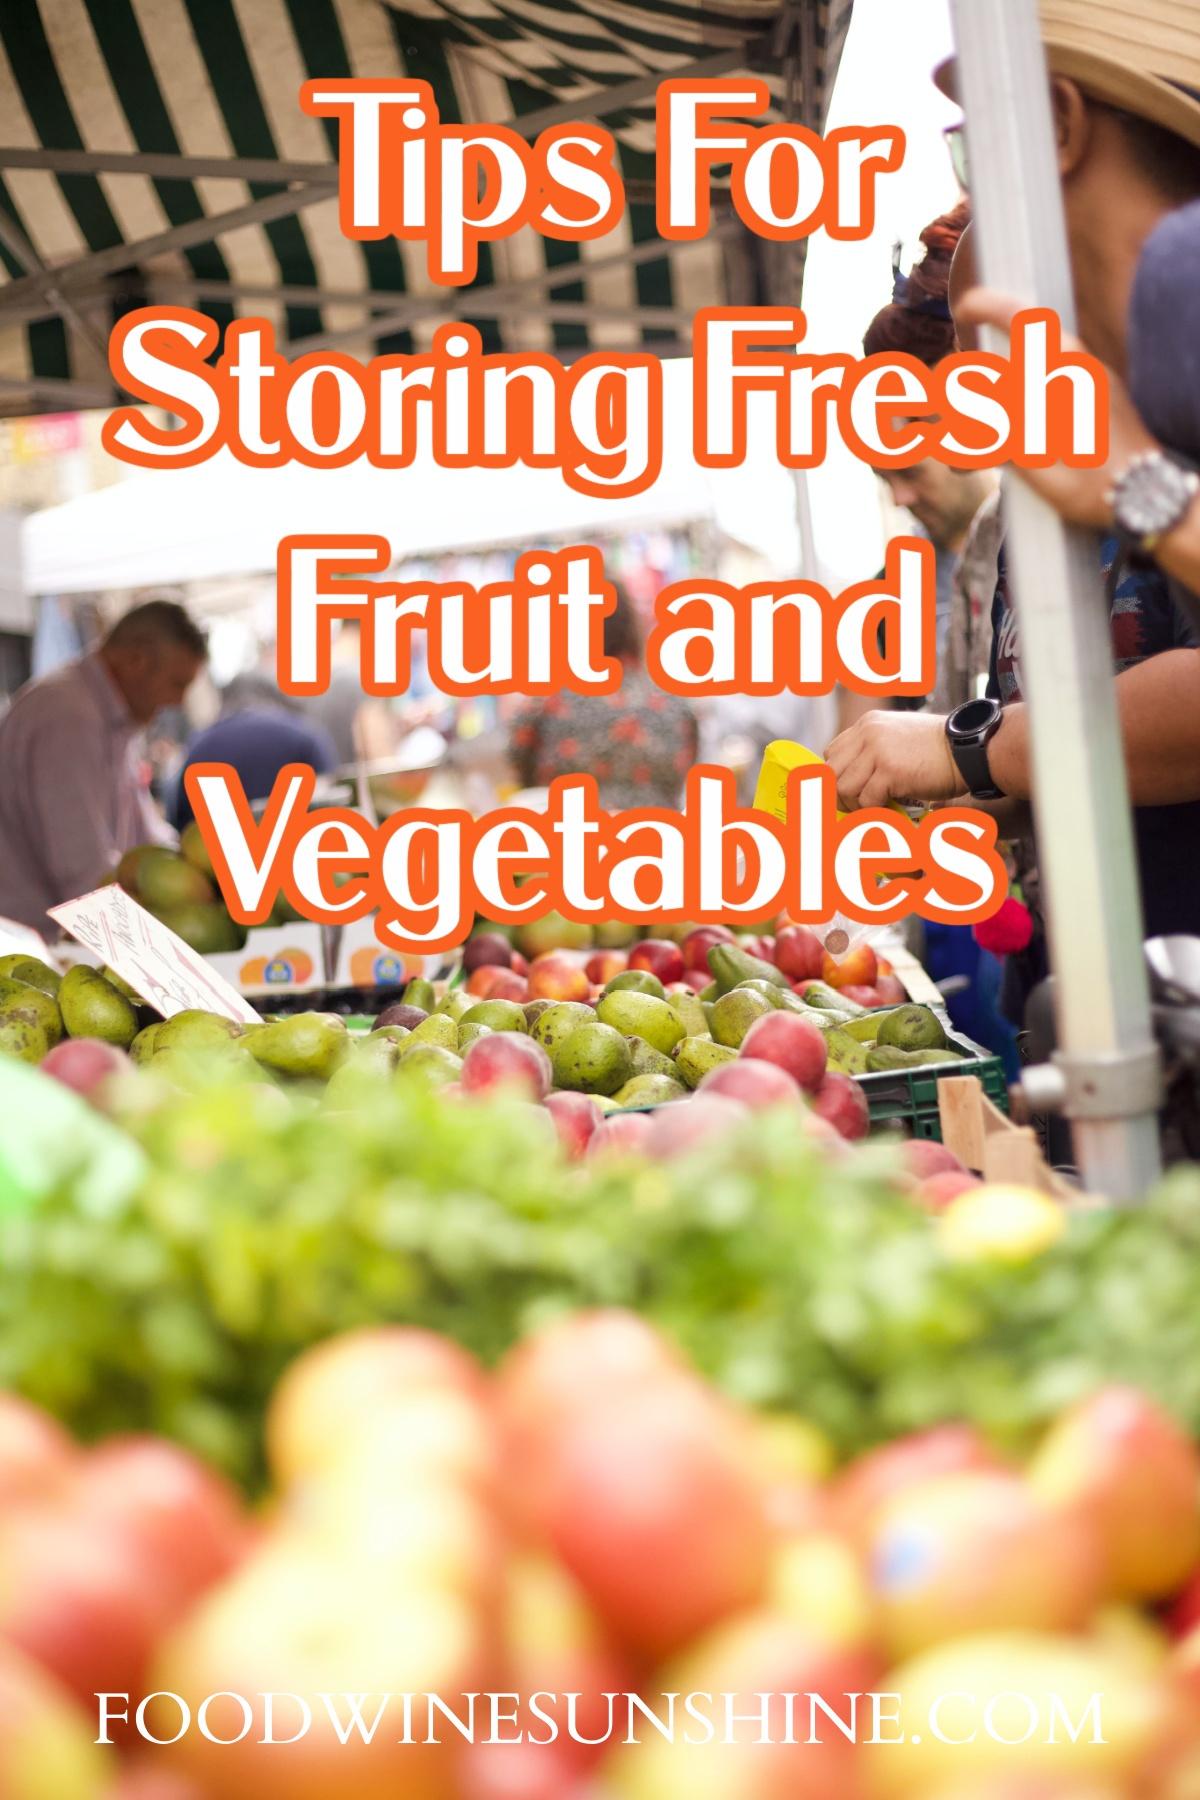 Tips For Storing Fresh Fruit and Vegetables